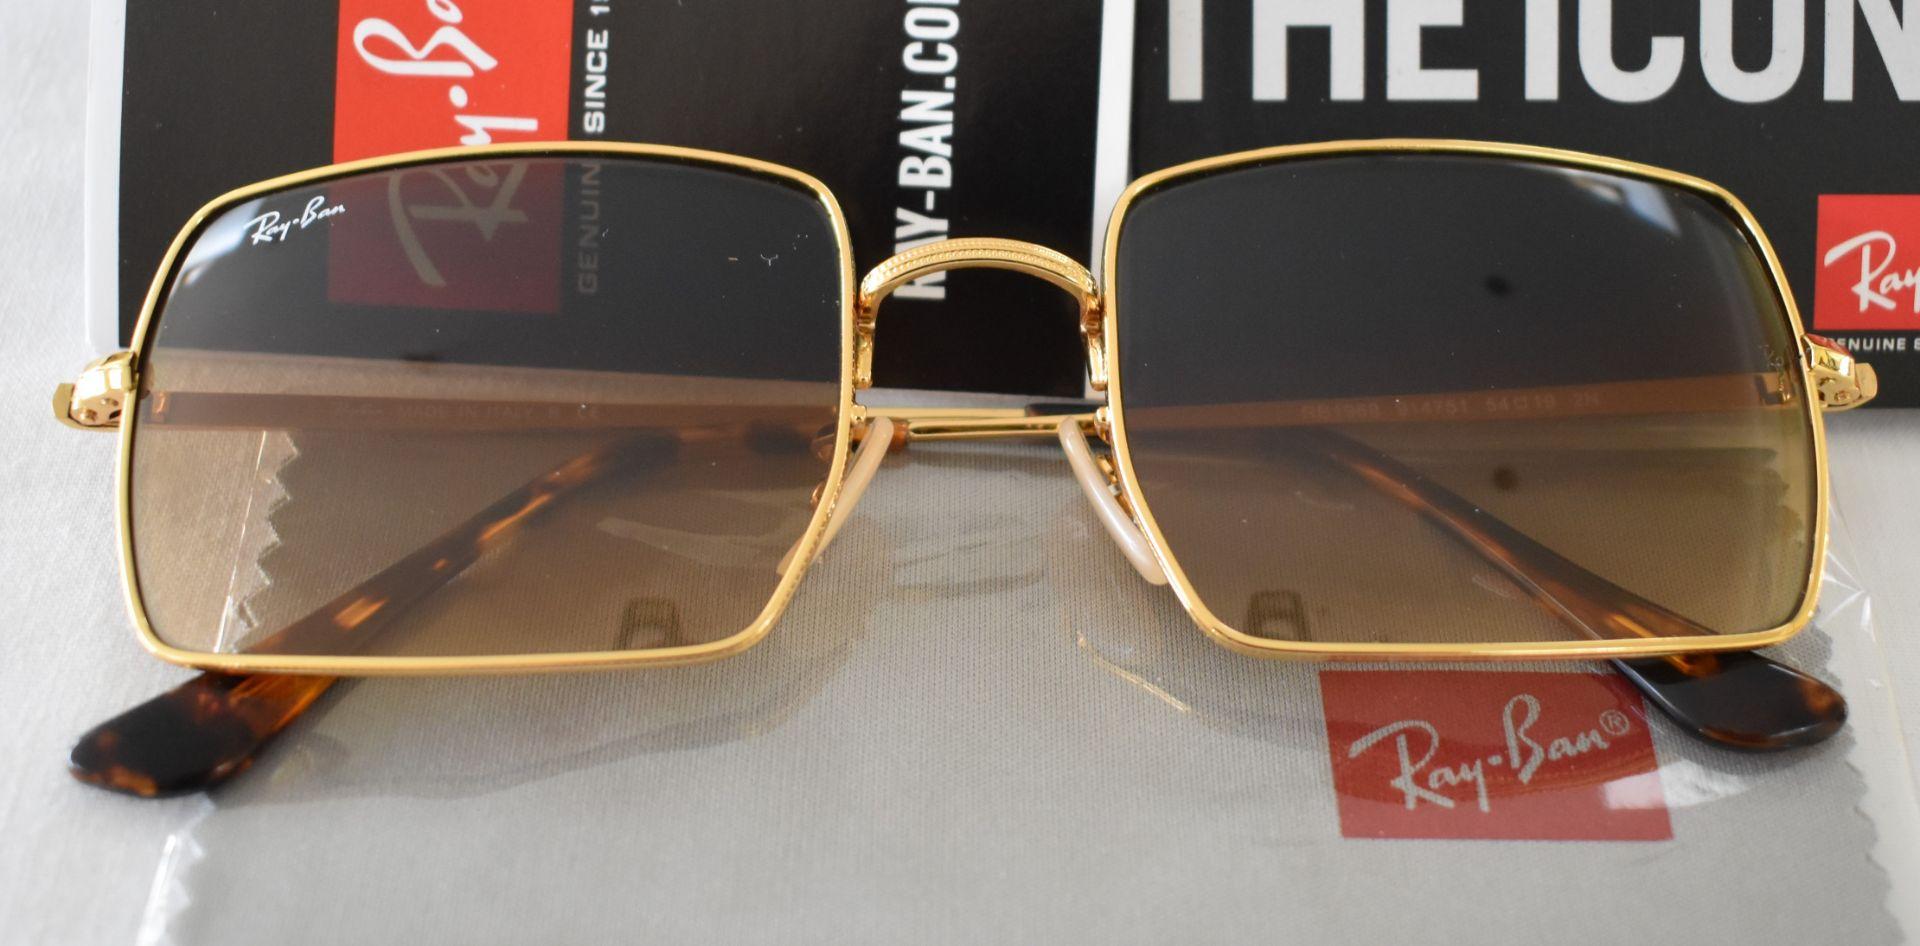 Ray Ban Sunglasses ORB1969 914751 *3N - Image 2 of 3